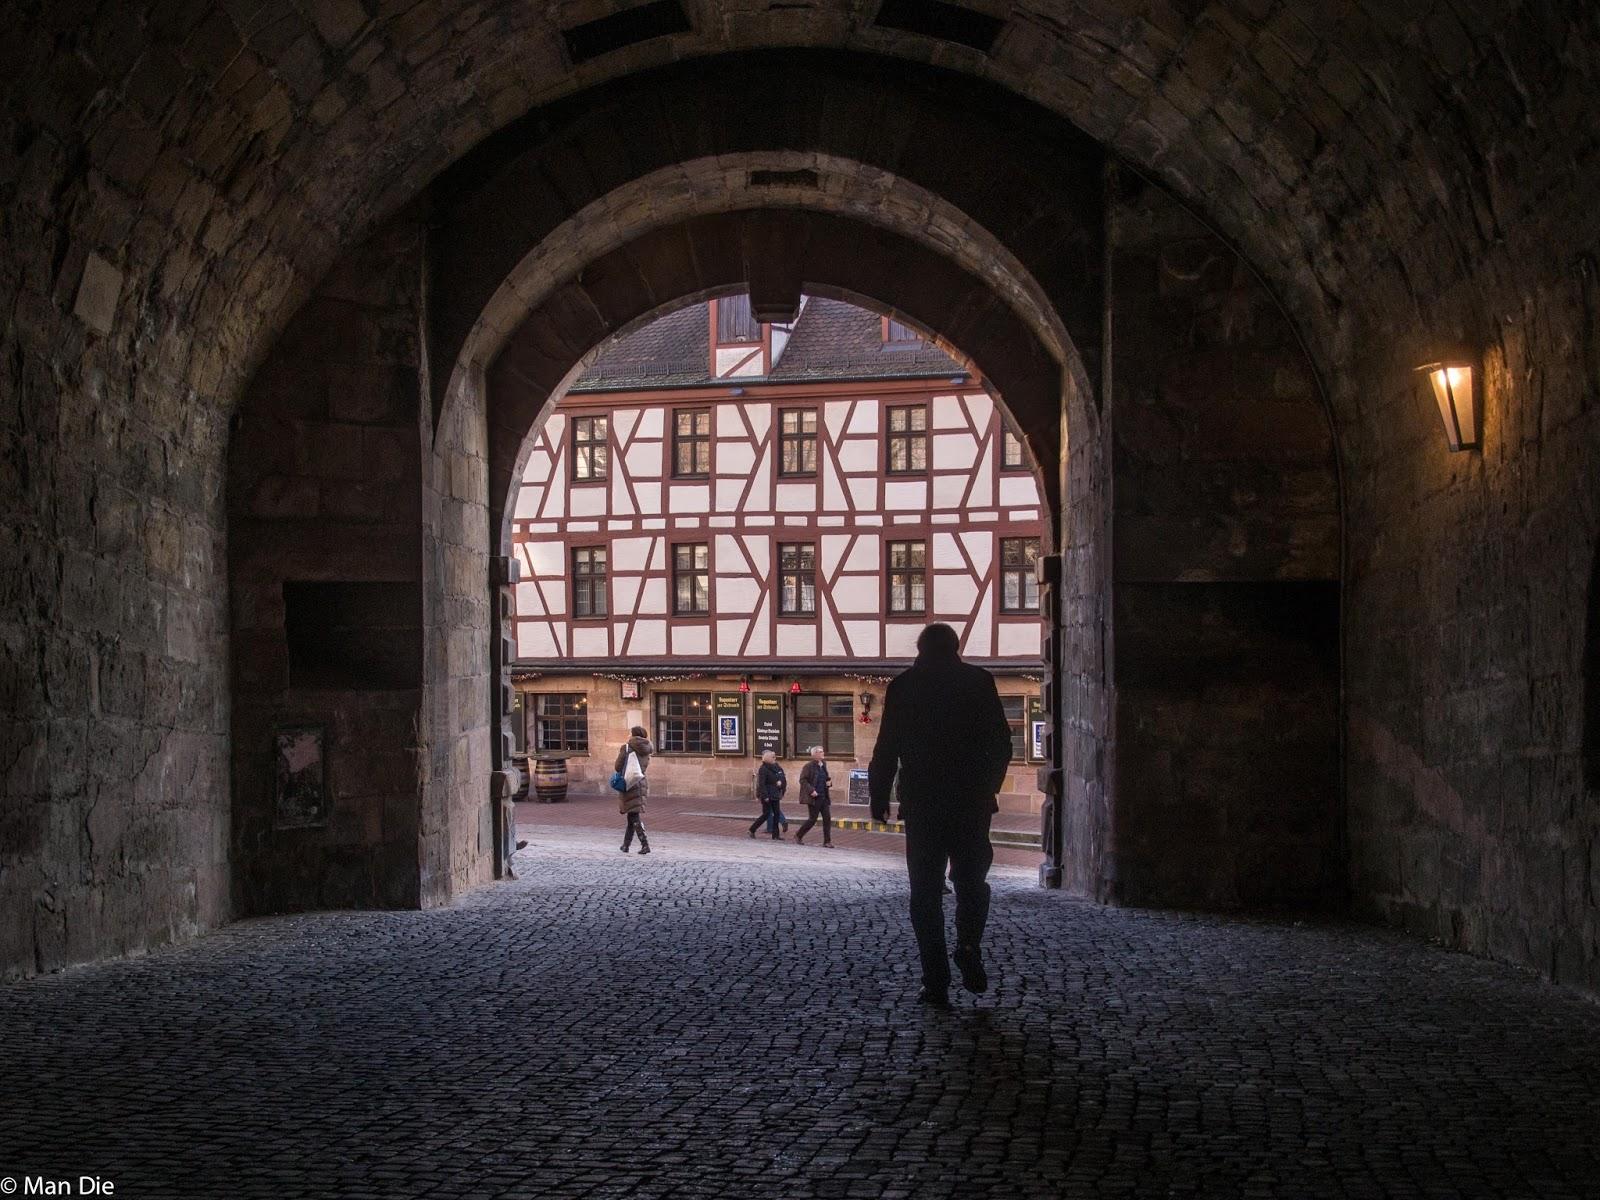 Tiergärtnertor in Nürnberg